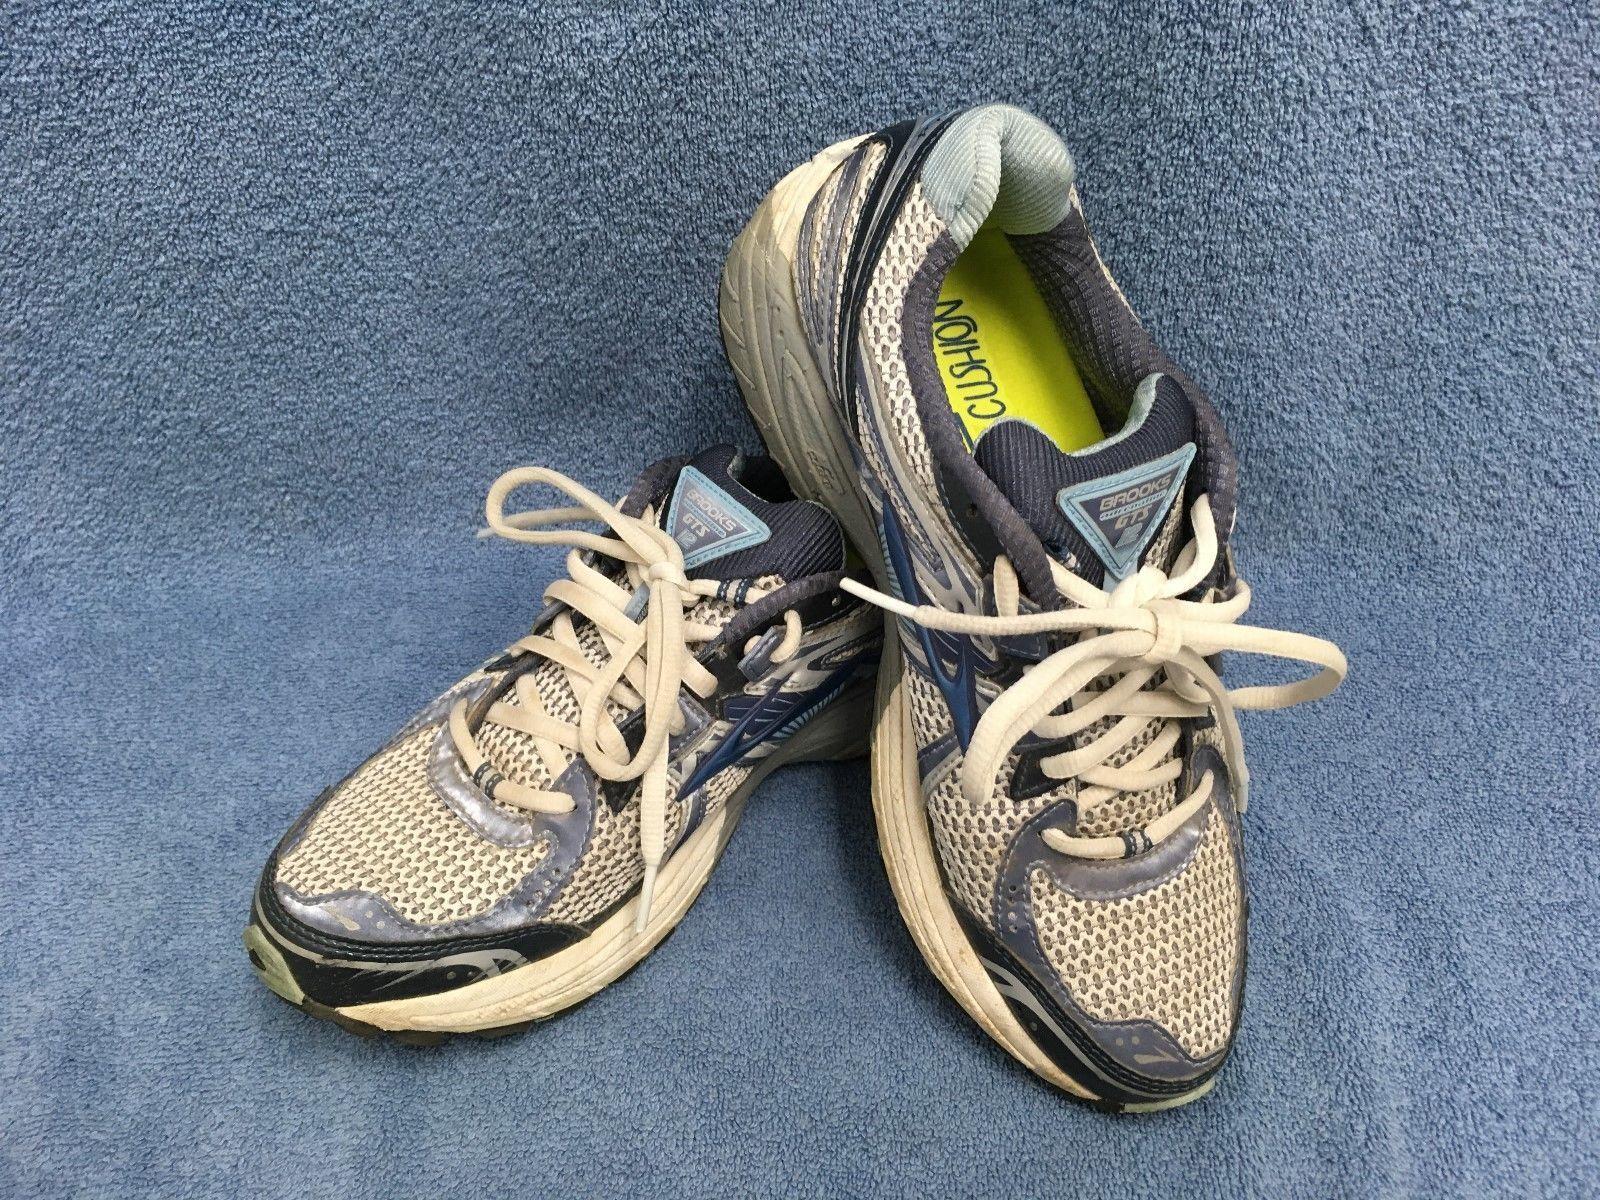 b0b399b9774a5 BROOKS ADRENALINE GTS 12 Womens Blue Gray Running Shoes Size 9.5 Narrow (2A)